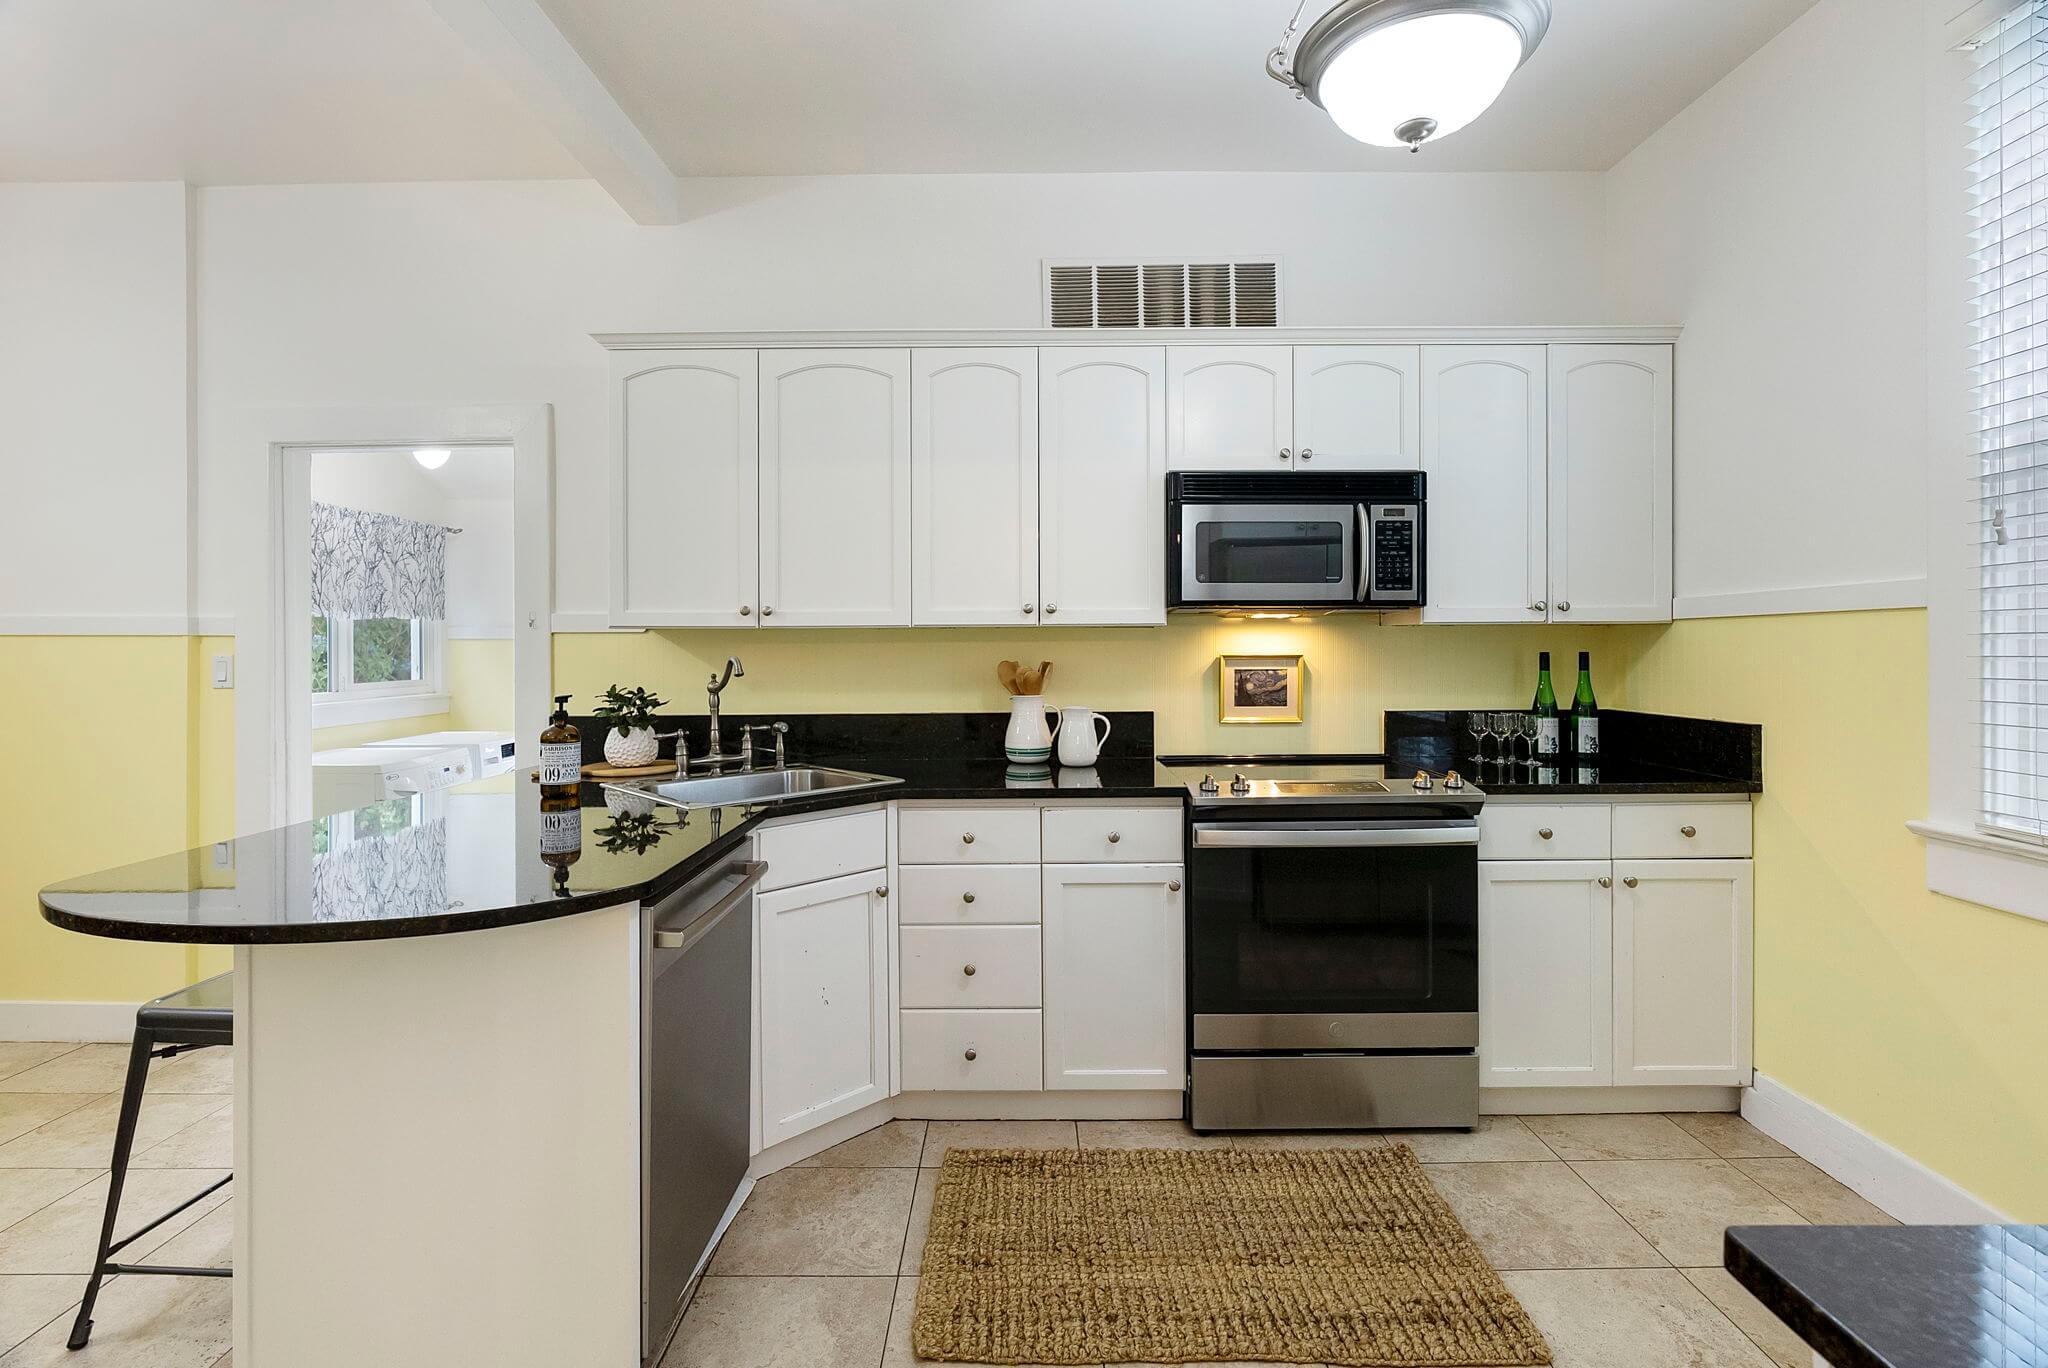 New stainless range and dishwasher